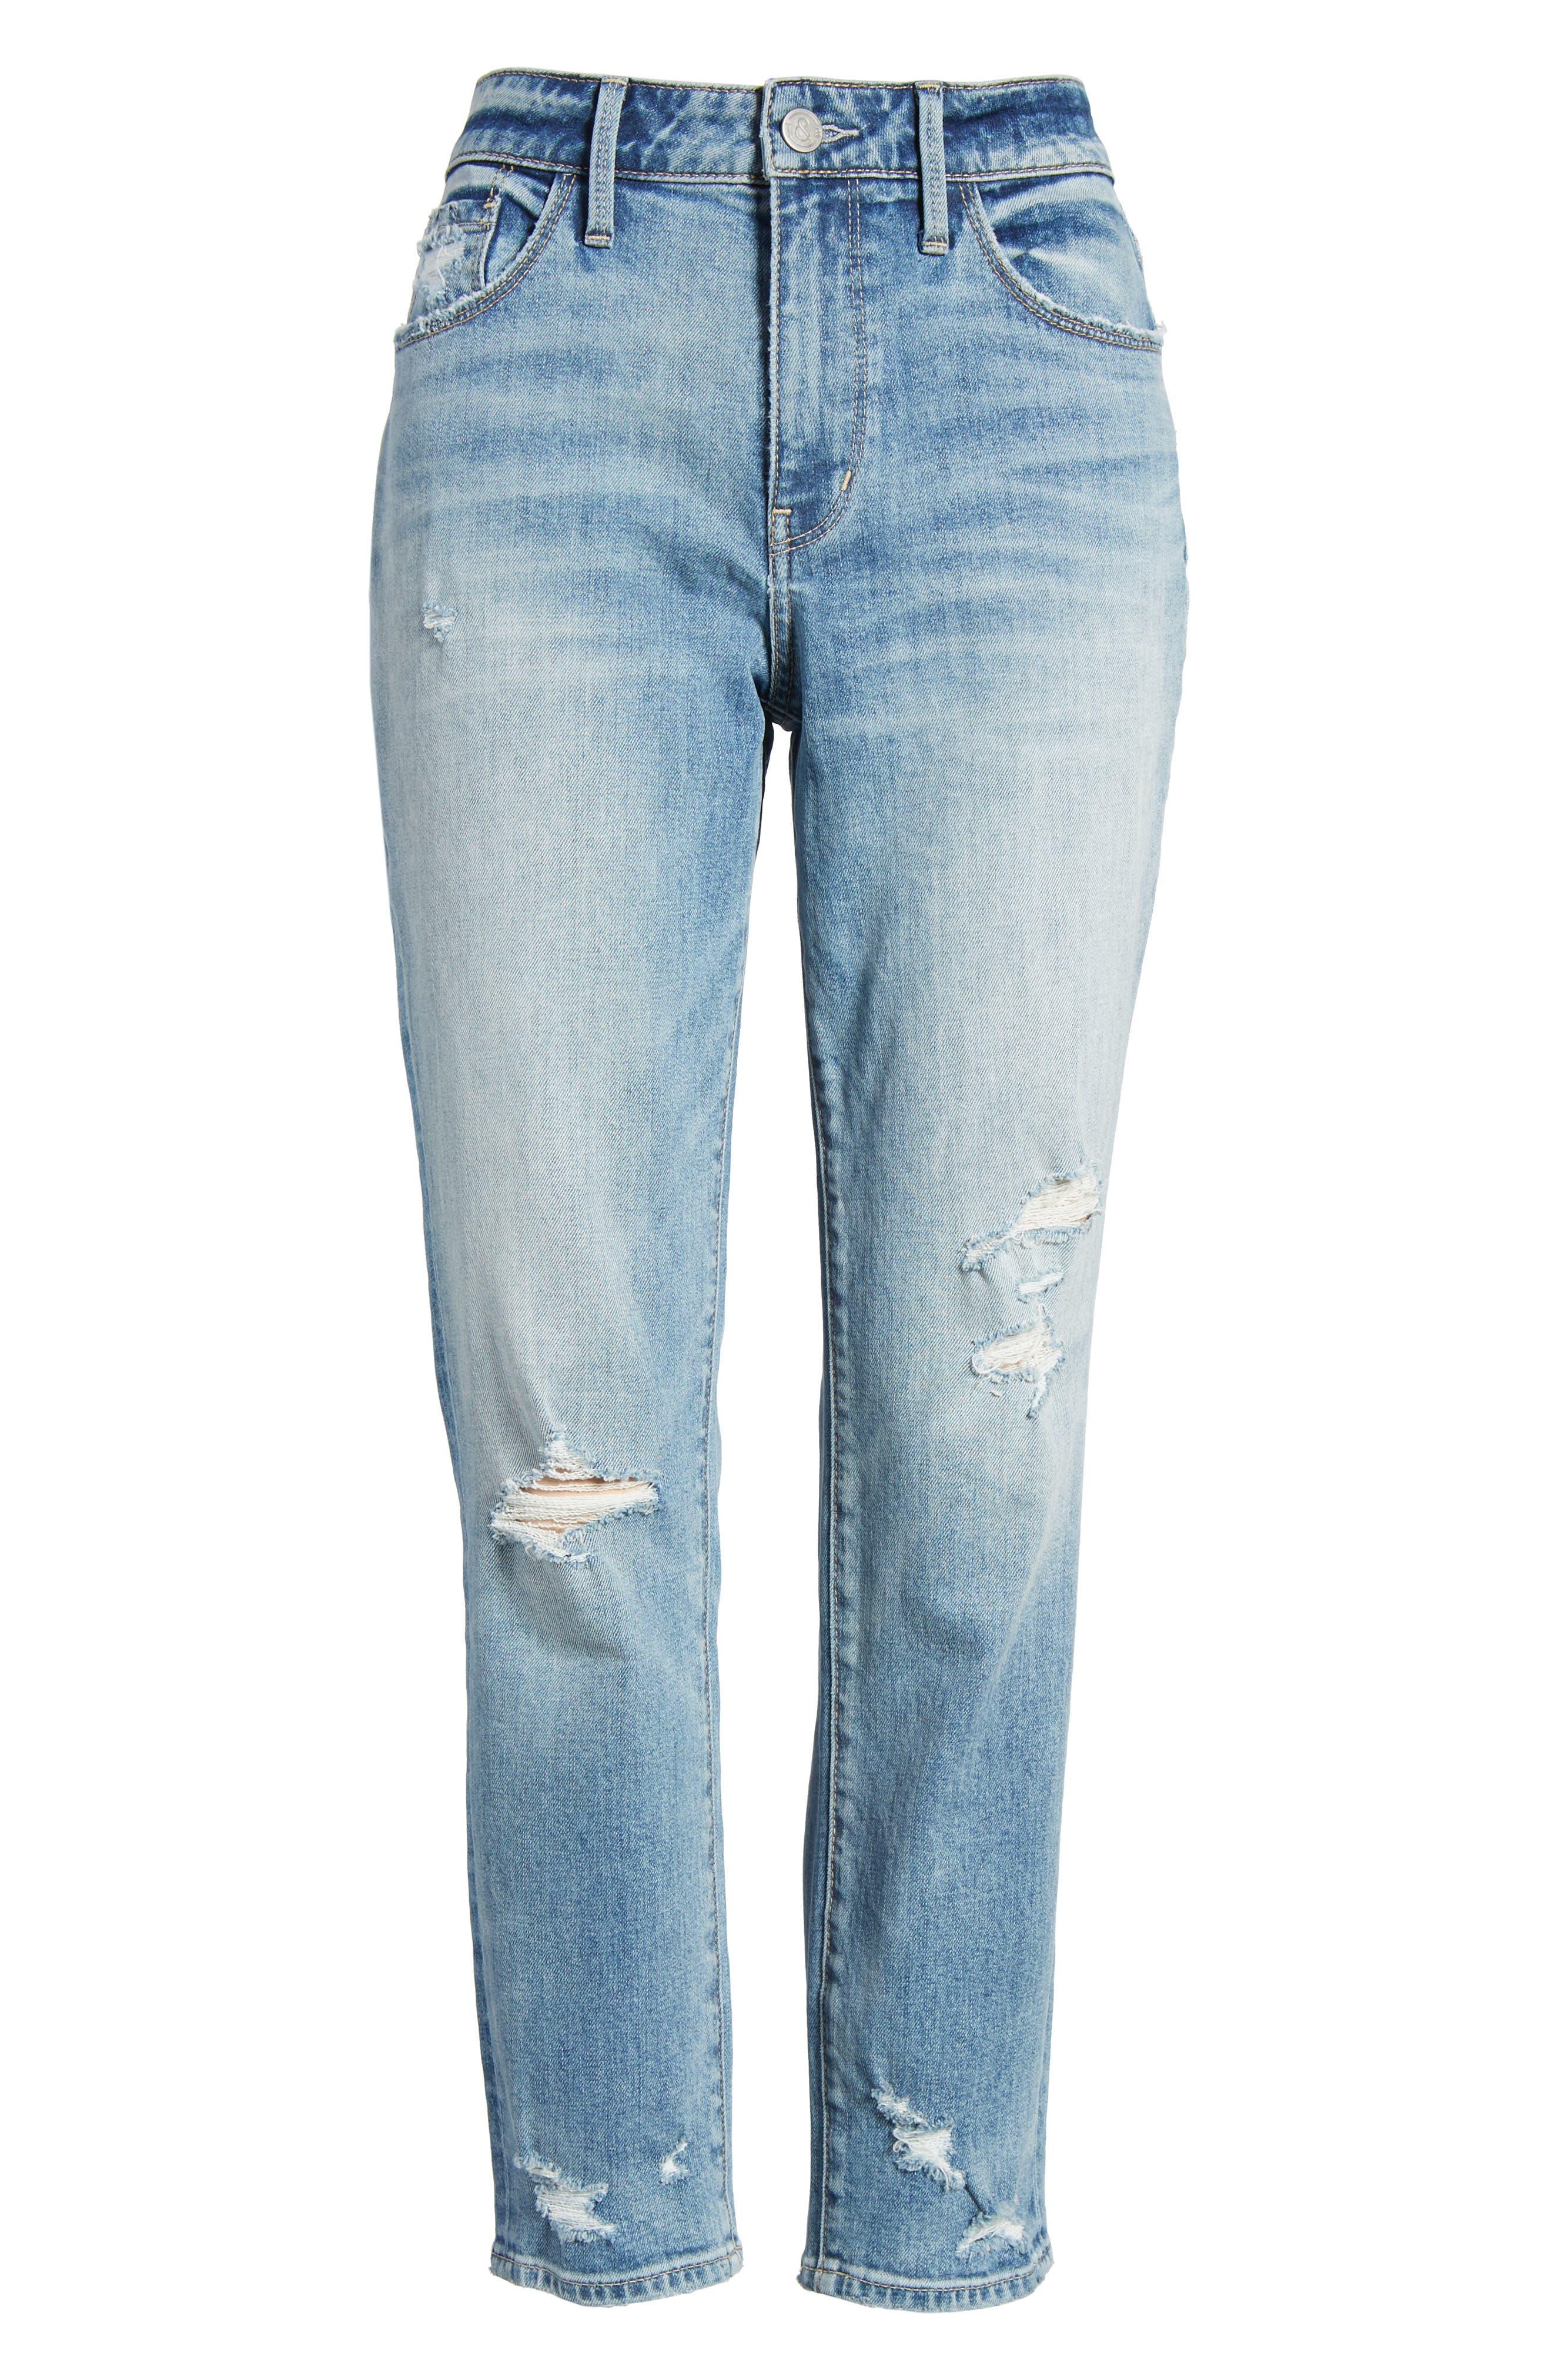 Loose Fit Slim Jeans,                             Alternate thumbnail 6, color,                             Gravel Light Destroy